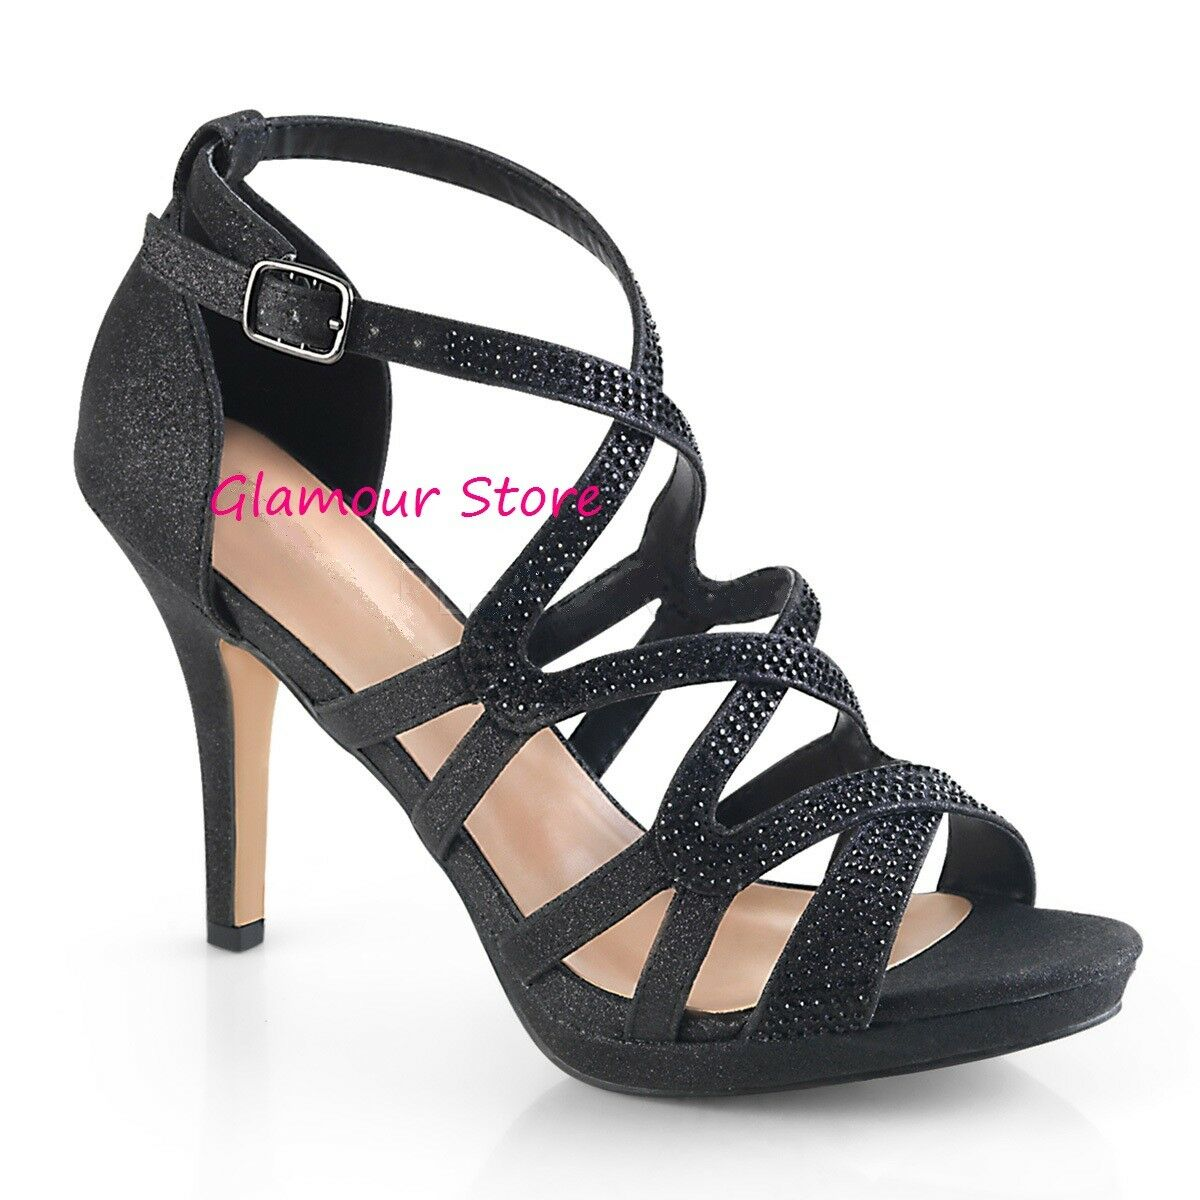 Sexy SANDALI SANDALI SANDALI STRASS tacco 9,5 dal 35 al 42 black mini plateau shoes GLAMOUR 0c1930